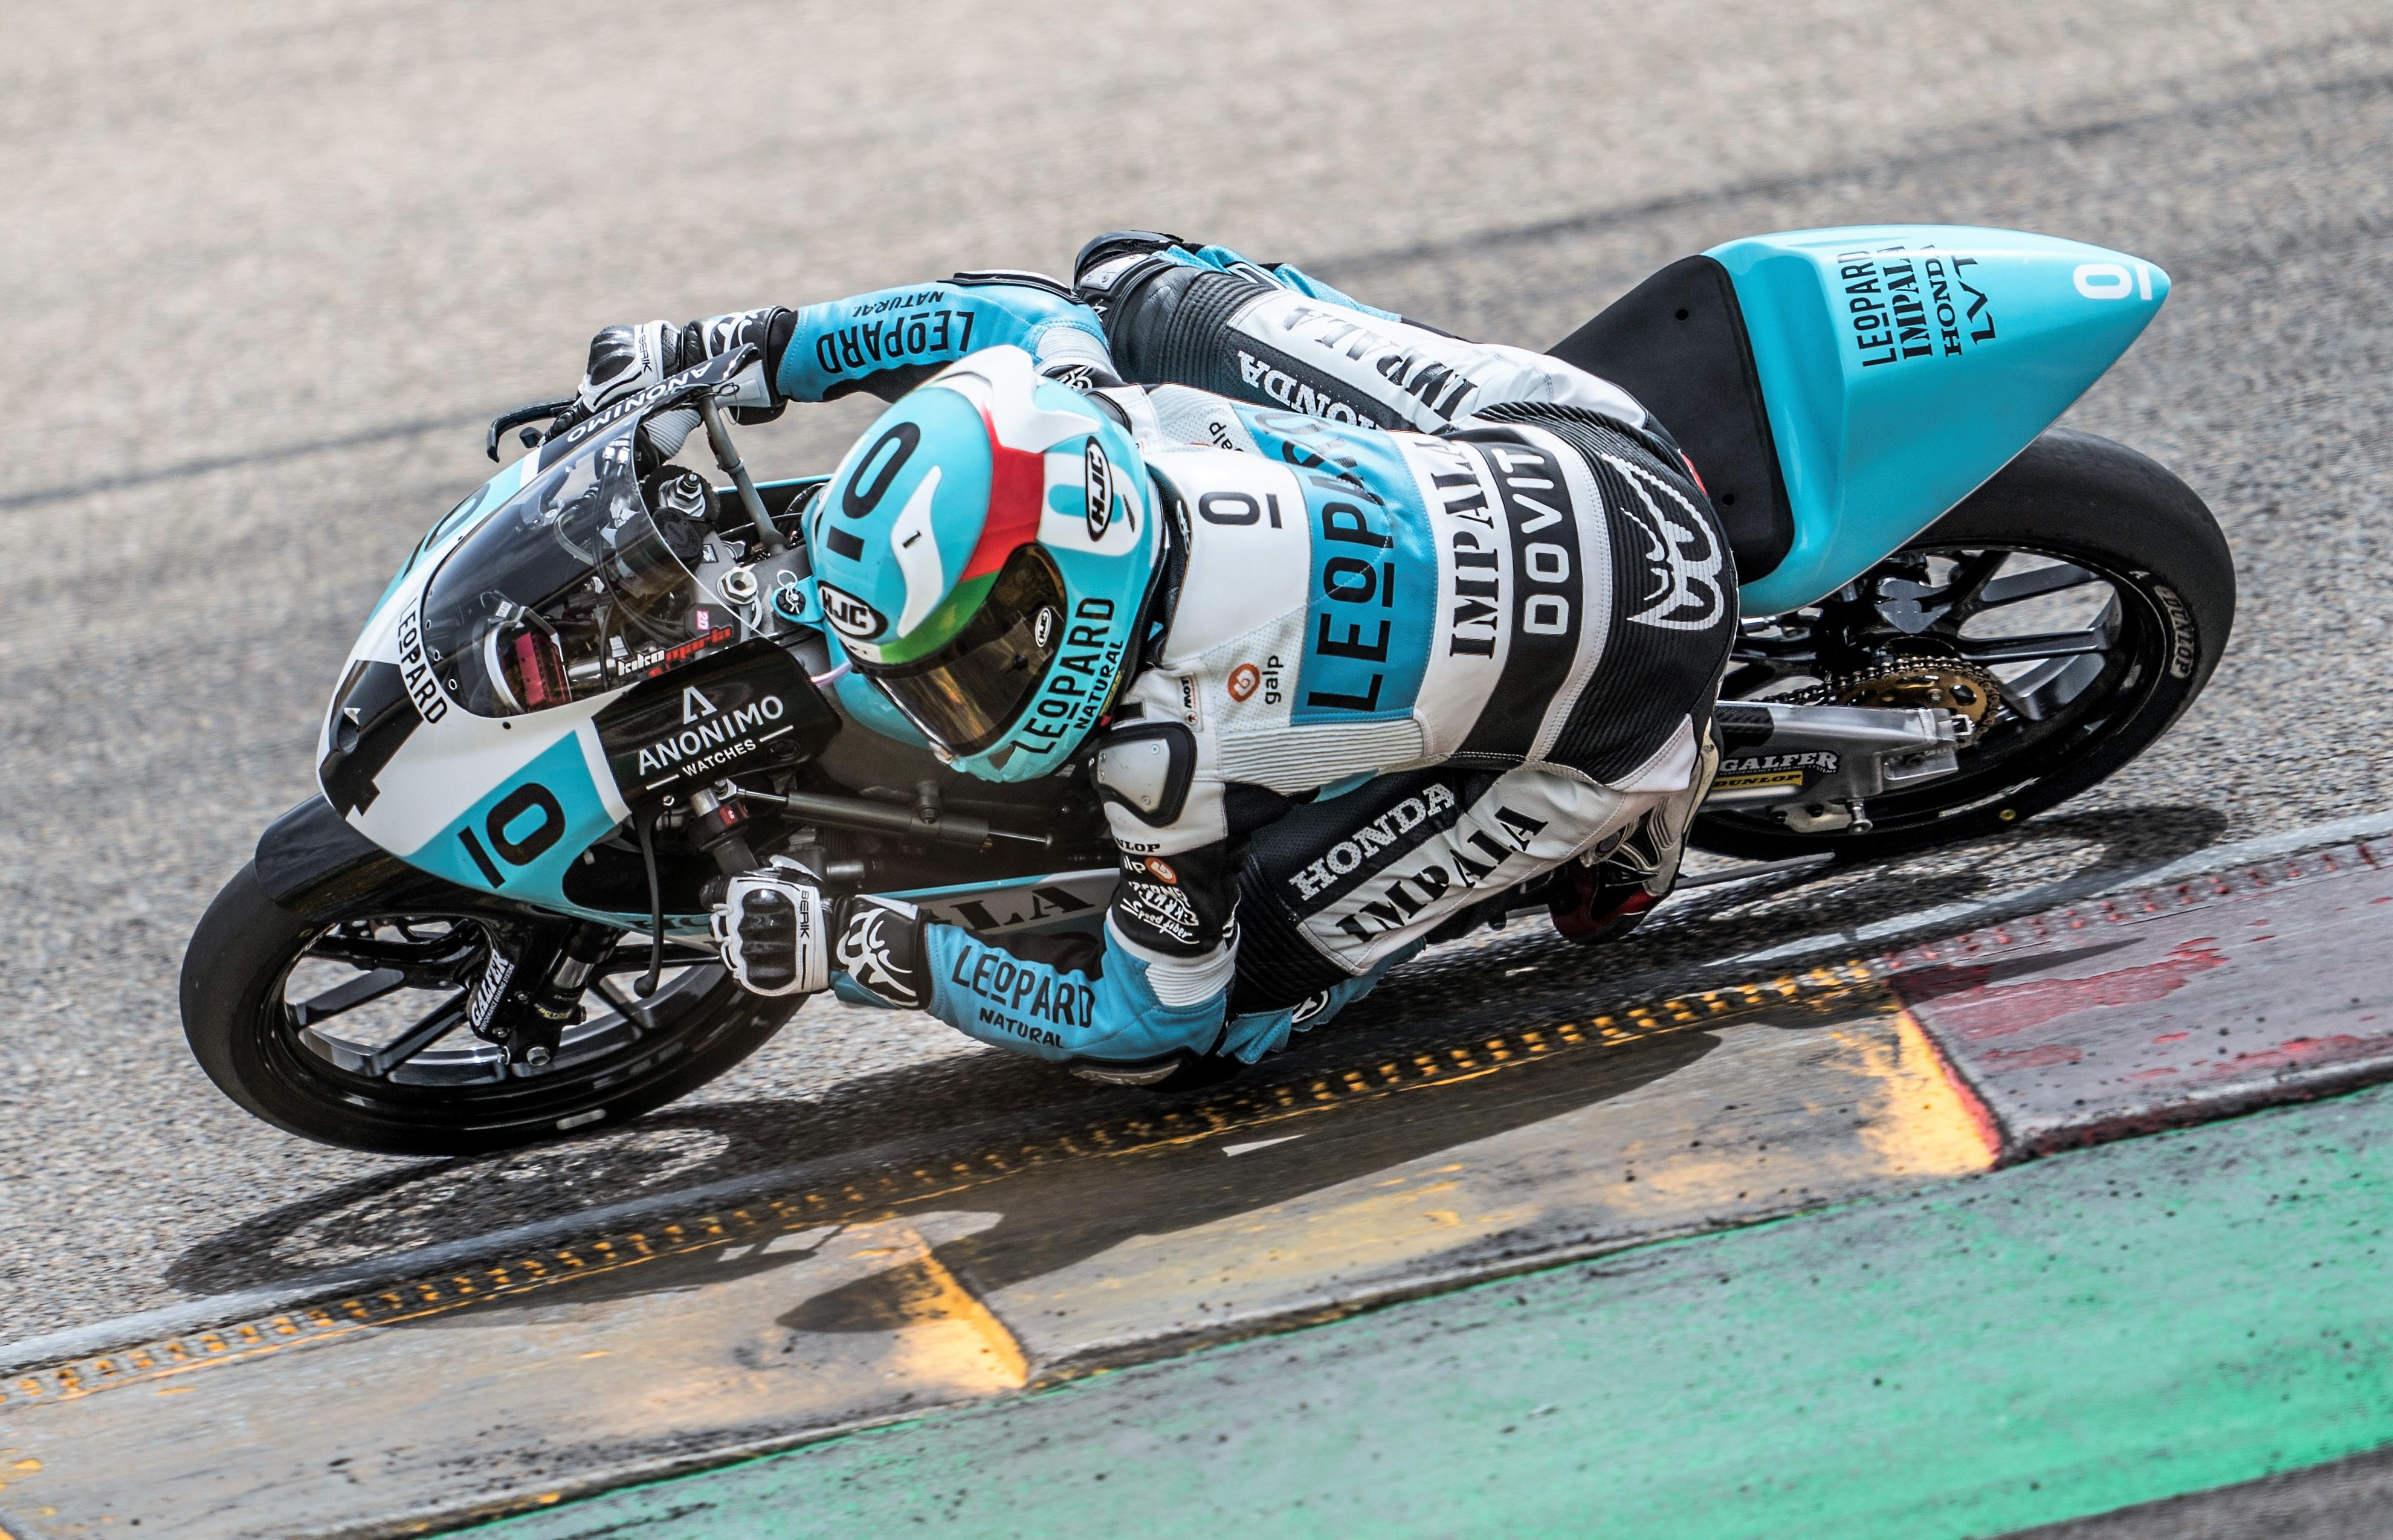 CEV,Repsol,Albacete,Pré-Moto3: Rueda vence, Kiko acaba 29º